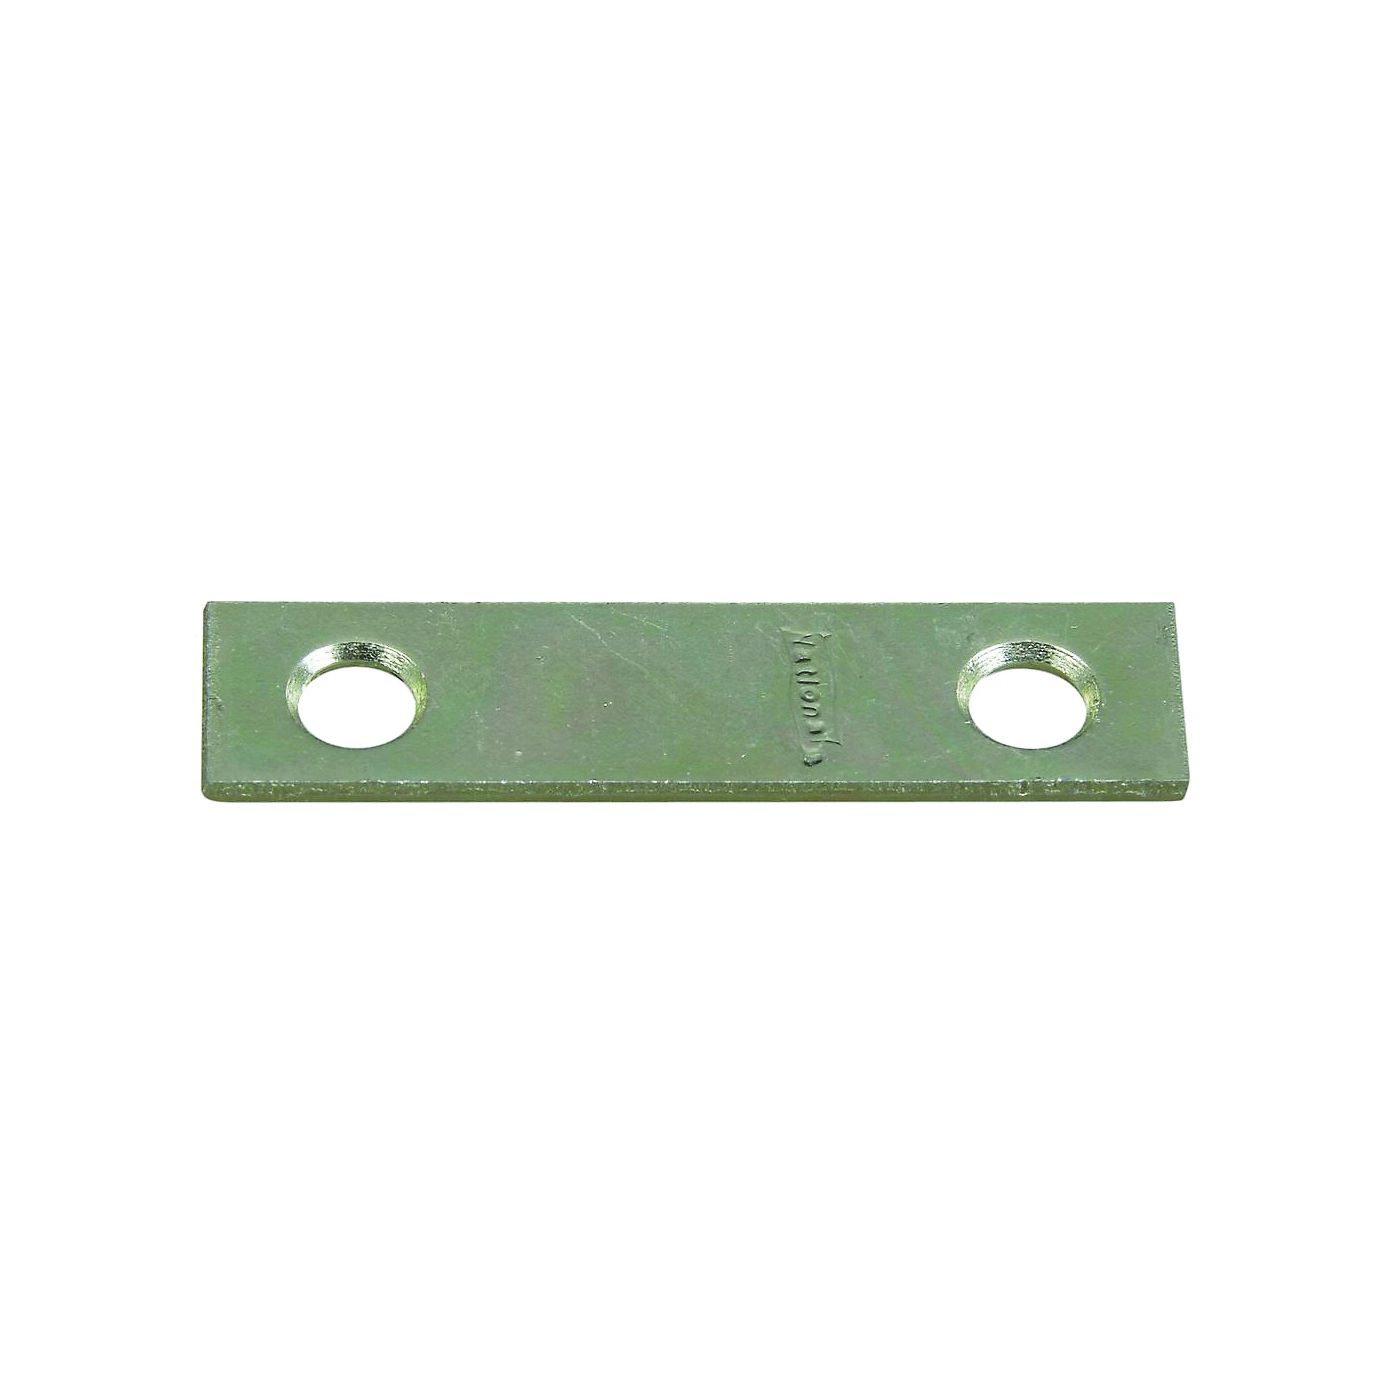 Picture of National Hardware 272716 Mending Brace, 2 in L, 1/2 in W, Steel, Zinc, Screw Mounting